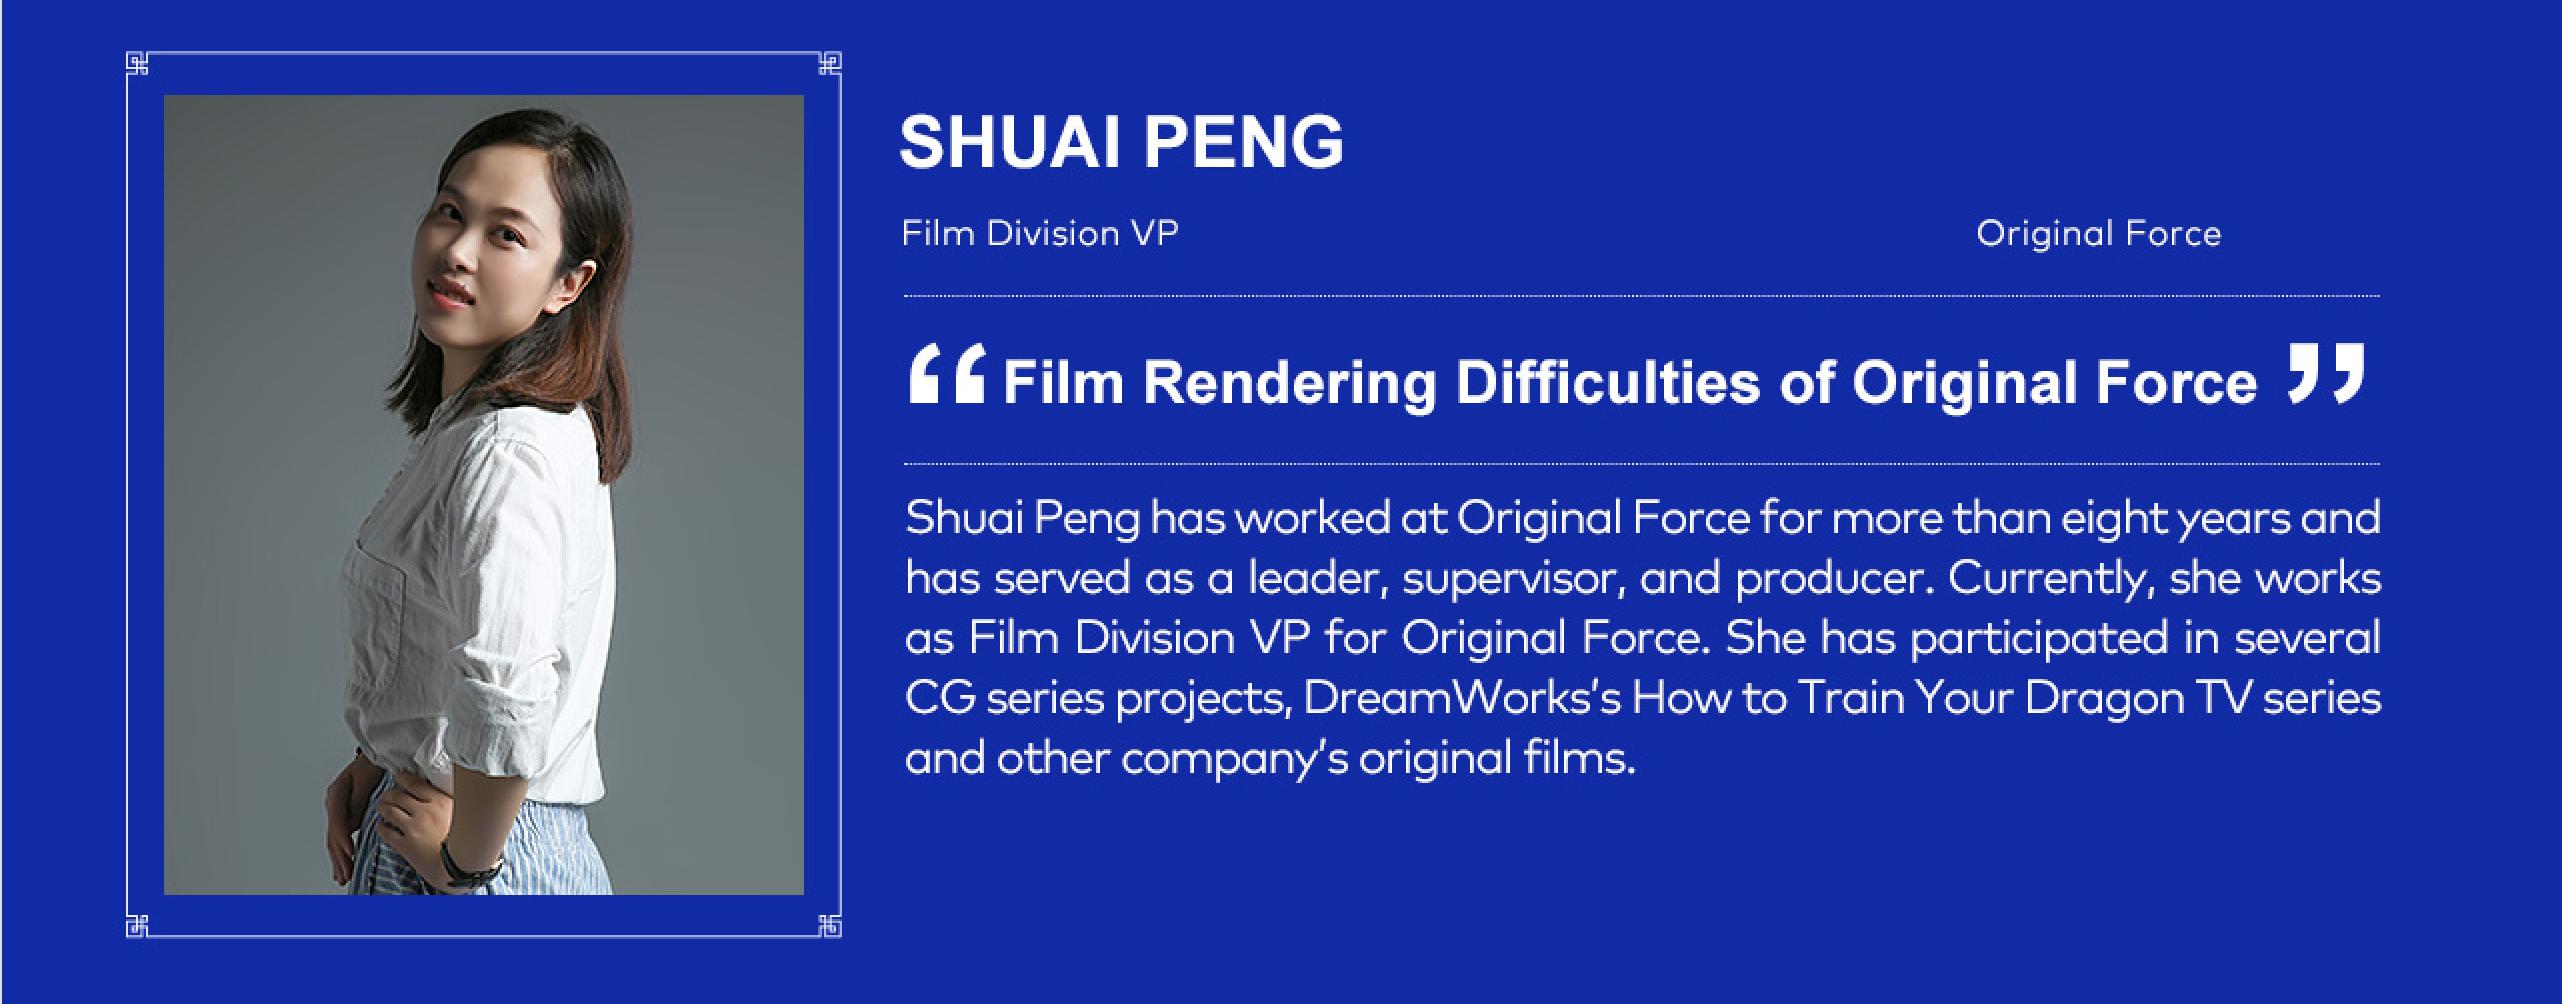 Shuai Peng - Film Division VP